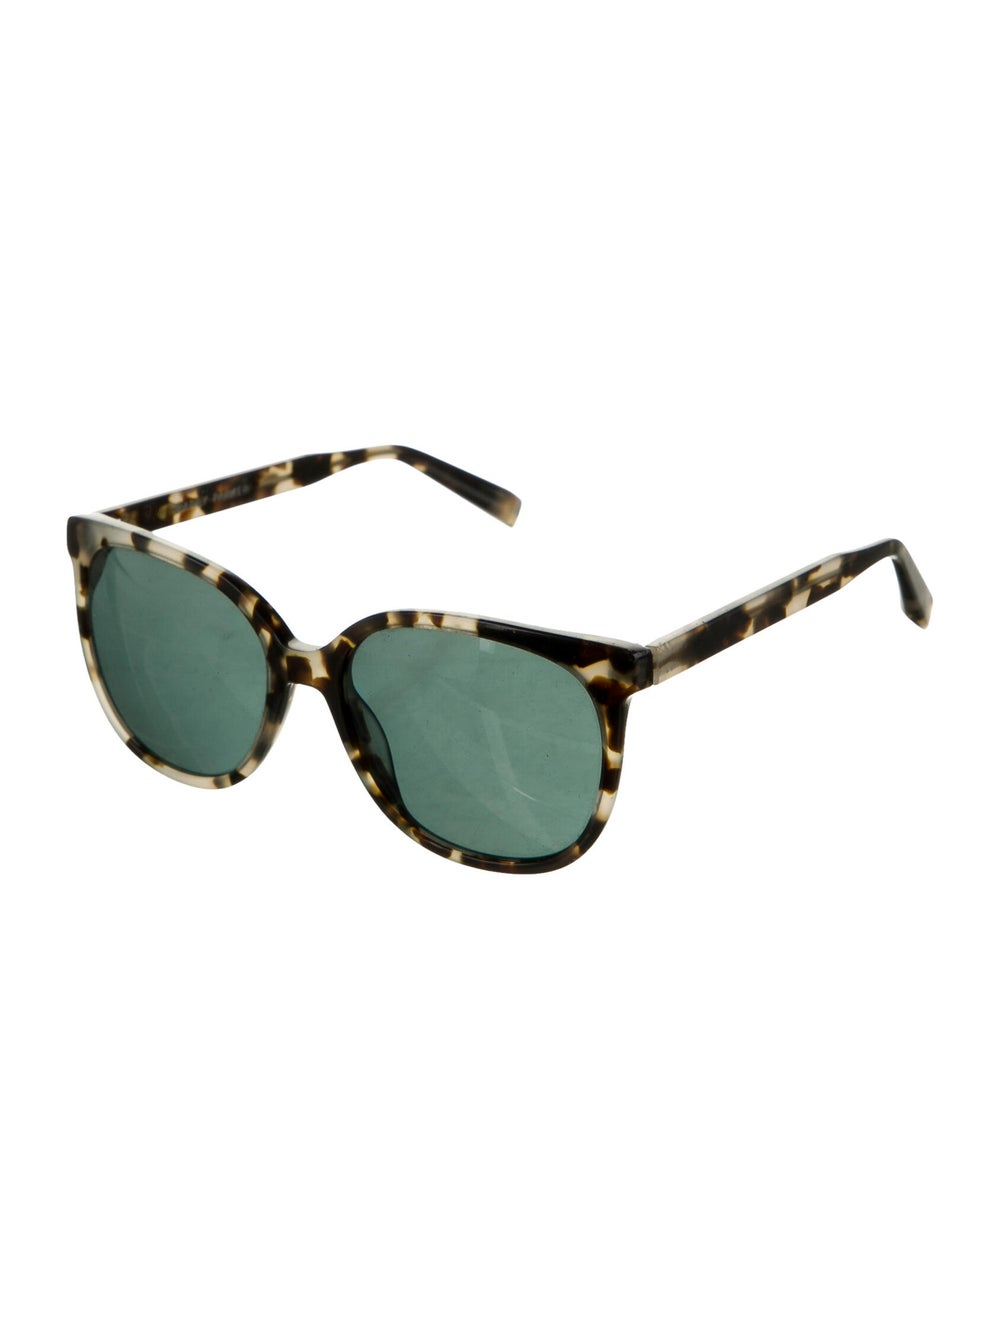 Warby Parker Tortoiseshell Wayfarer Sunglasses bl… - image 2